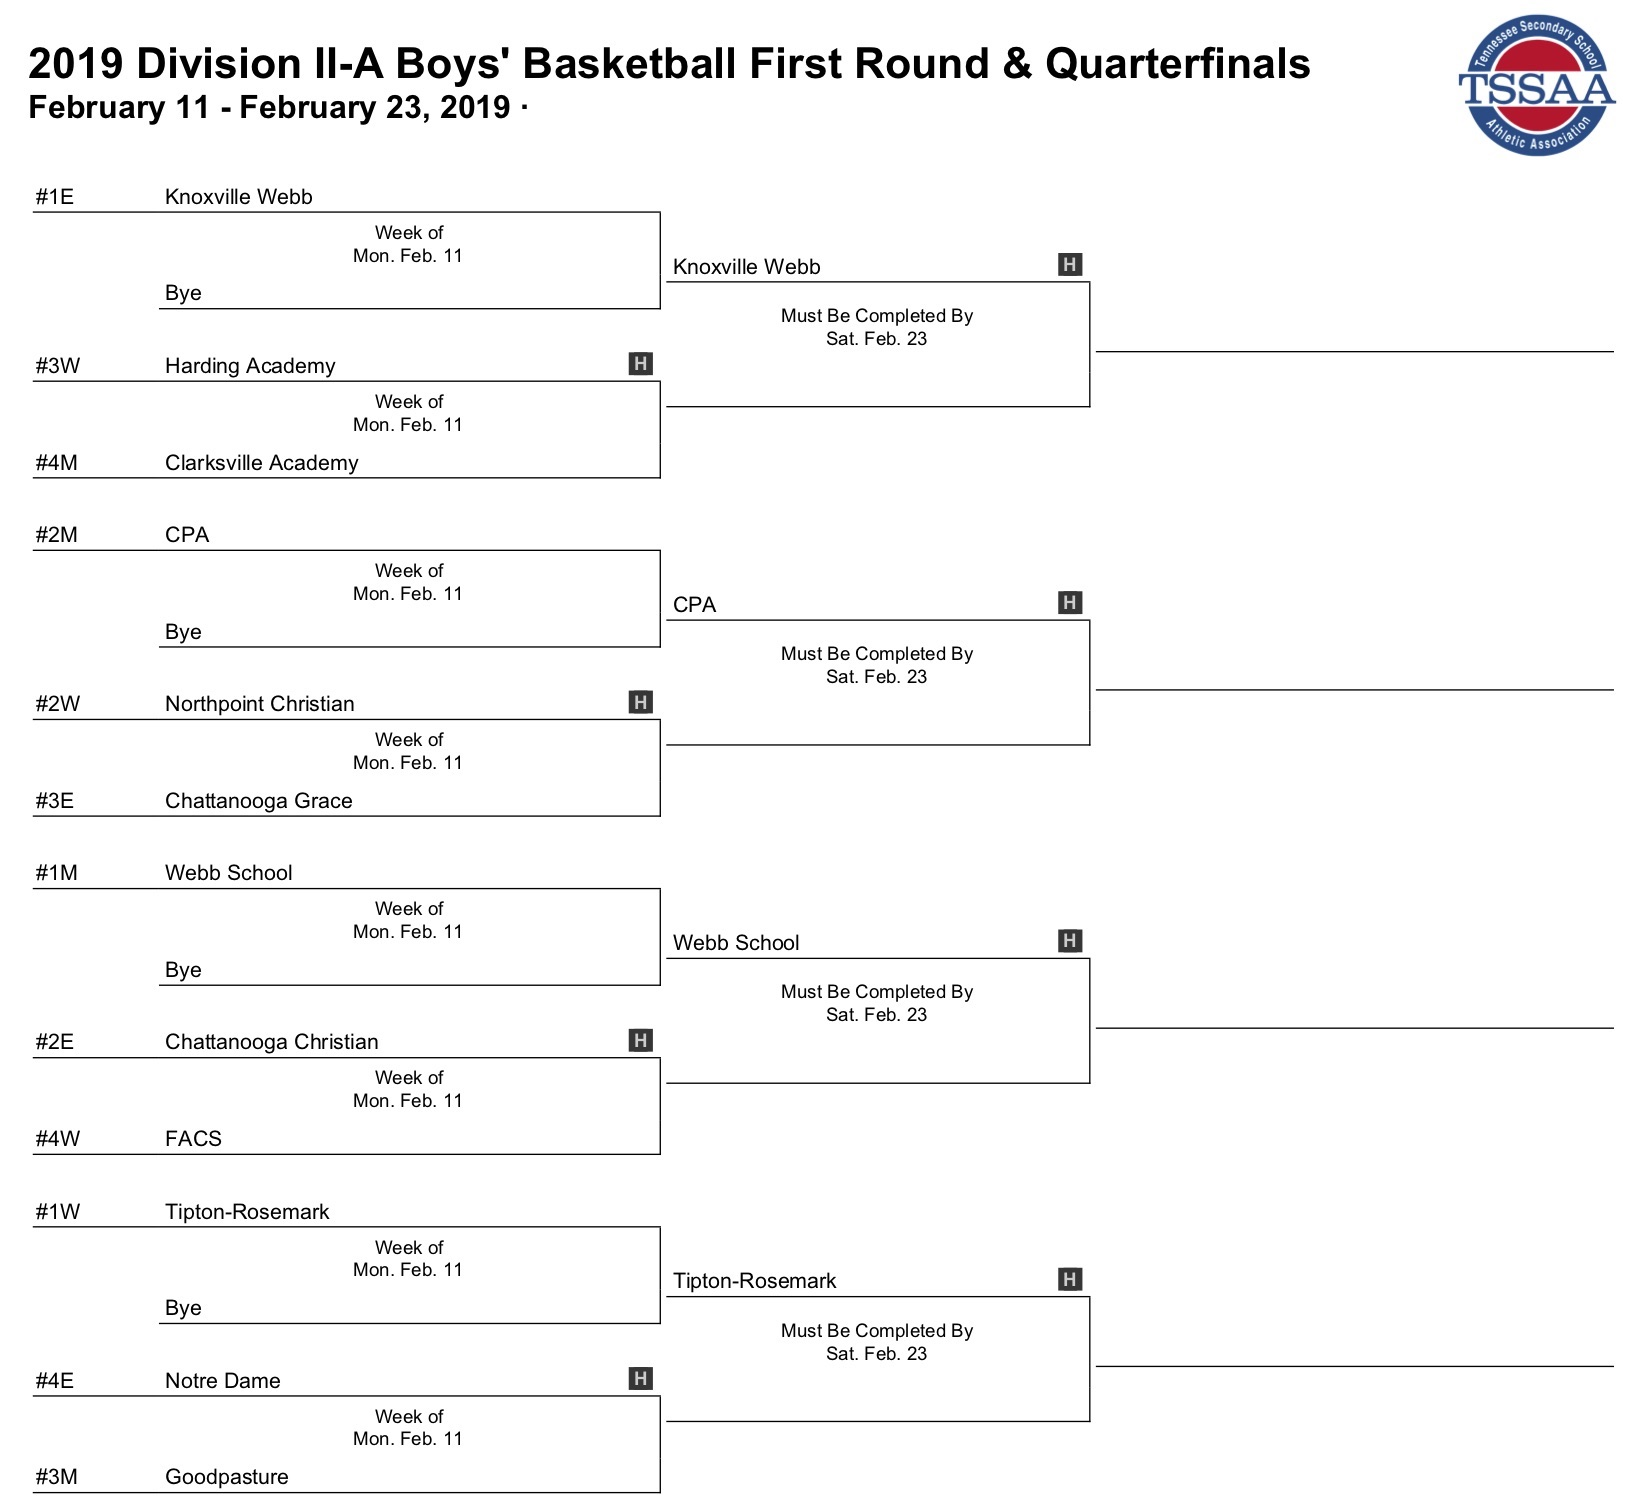 2019 Division II-A Boys' Basketball First Round & Quarterfinals Bracket.jpg